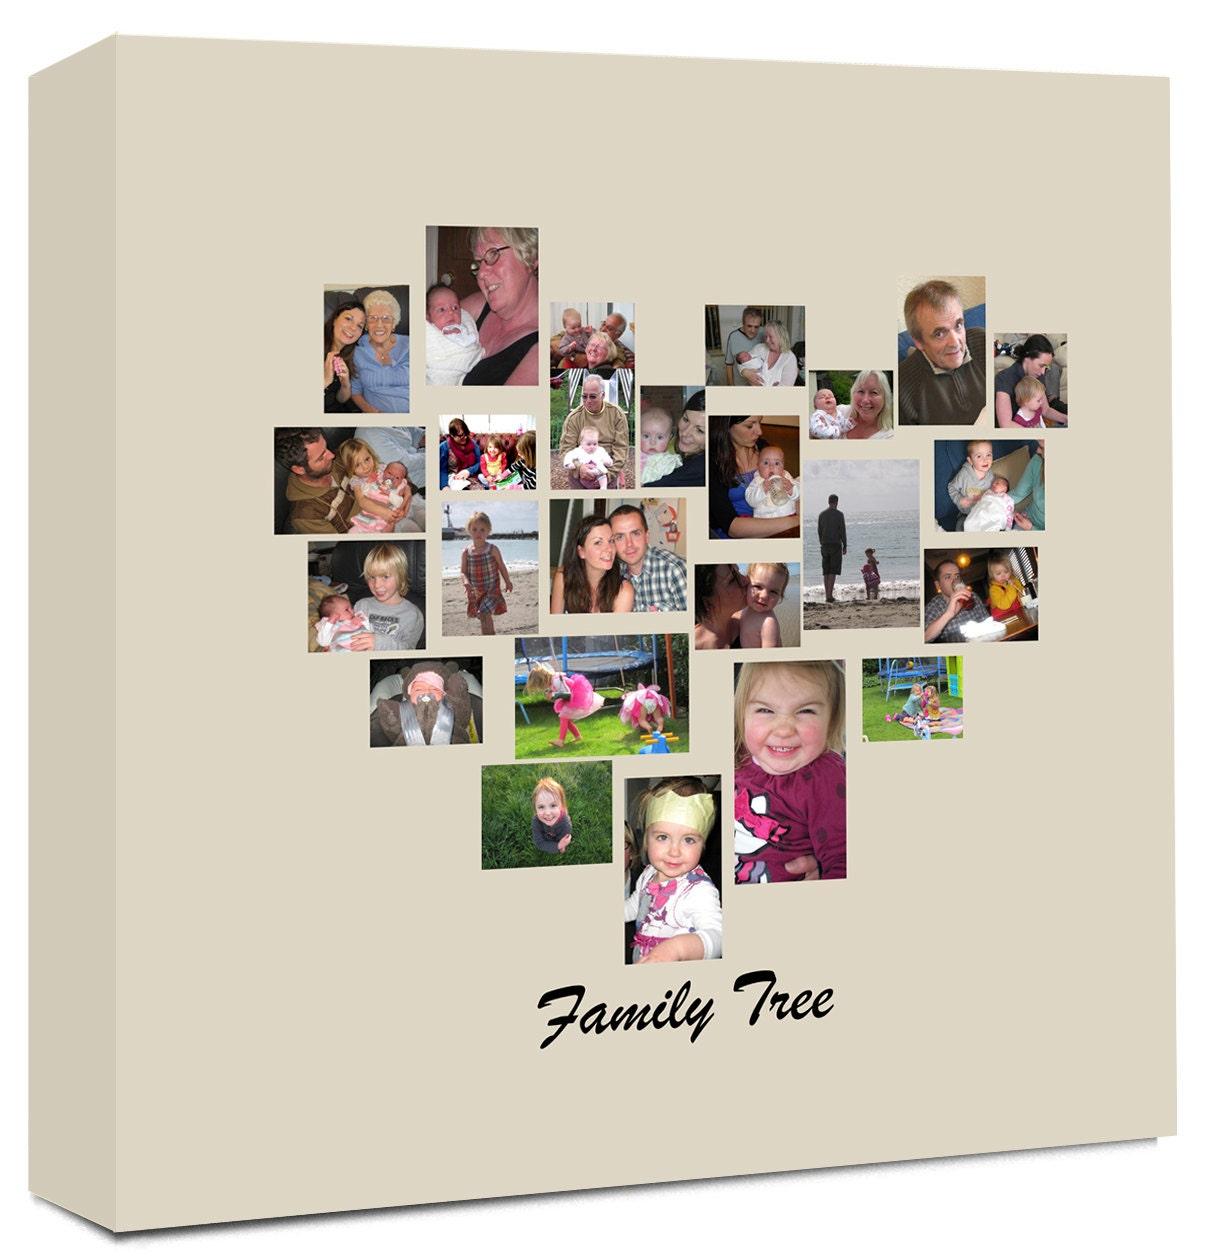 Family Tree herzförmige Foto-Collage auf Leinwand fertig zum   Etsy